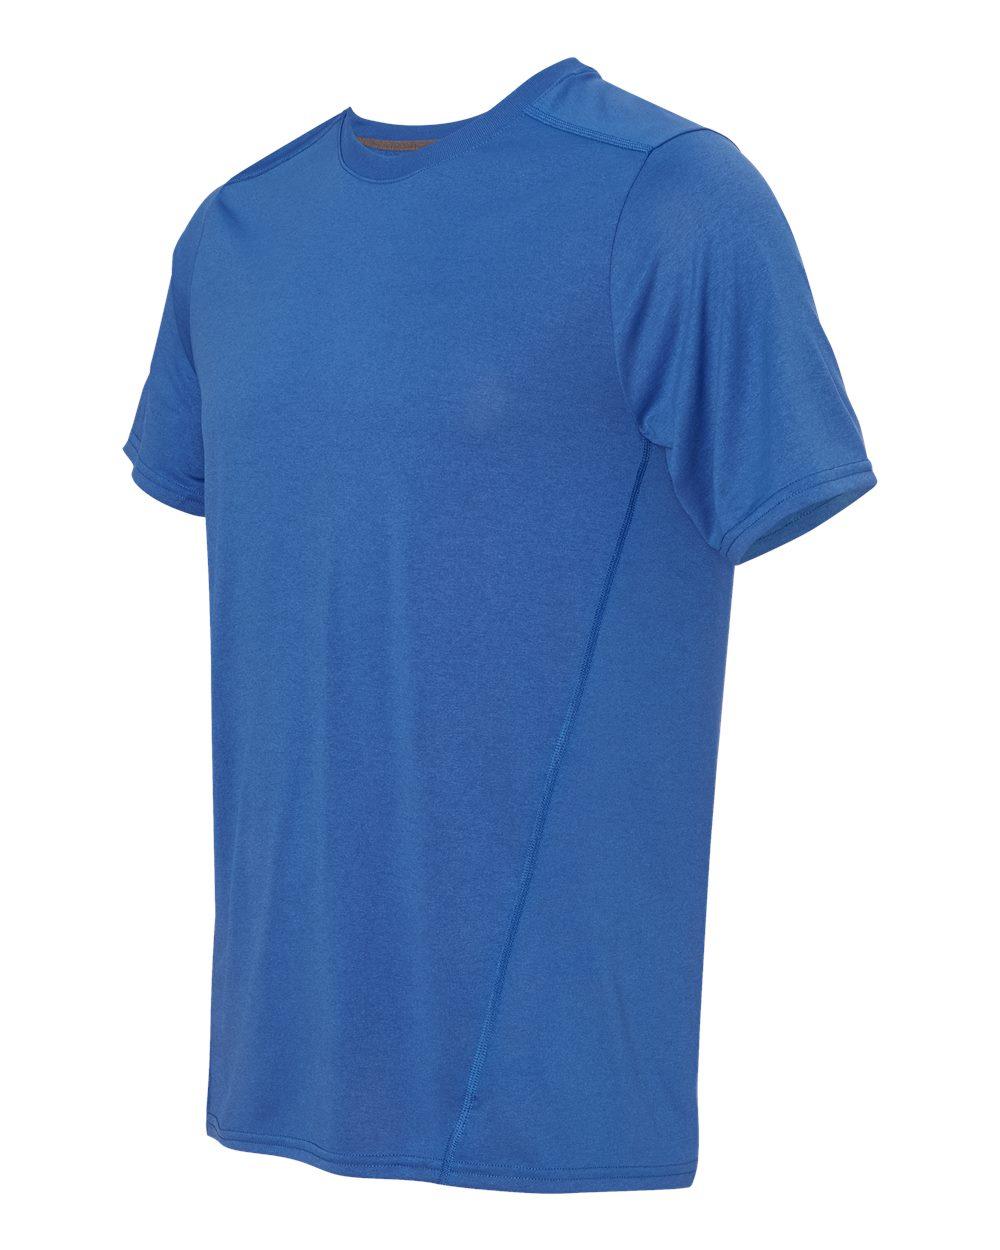 Gildan 47000 tech performance short sleeve t shirt for Gildan t shirt printing